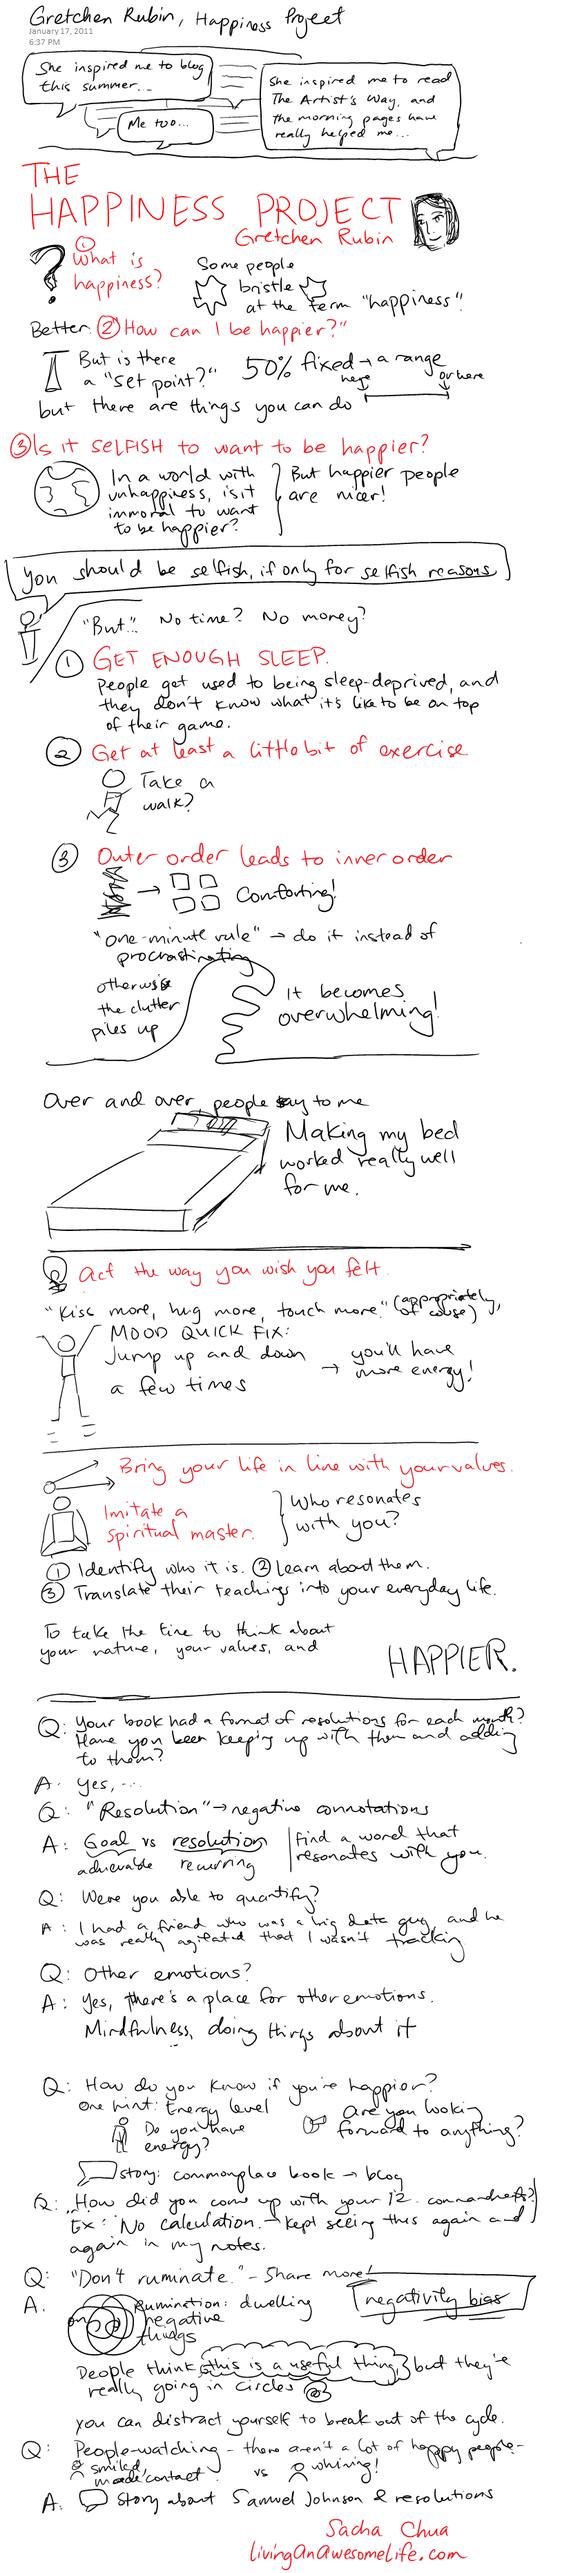 sketchnotes-gretchen-rubin-happiness[1]